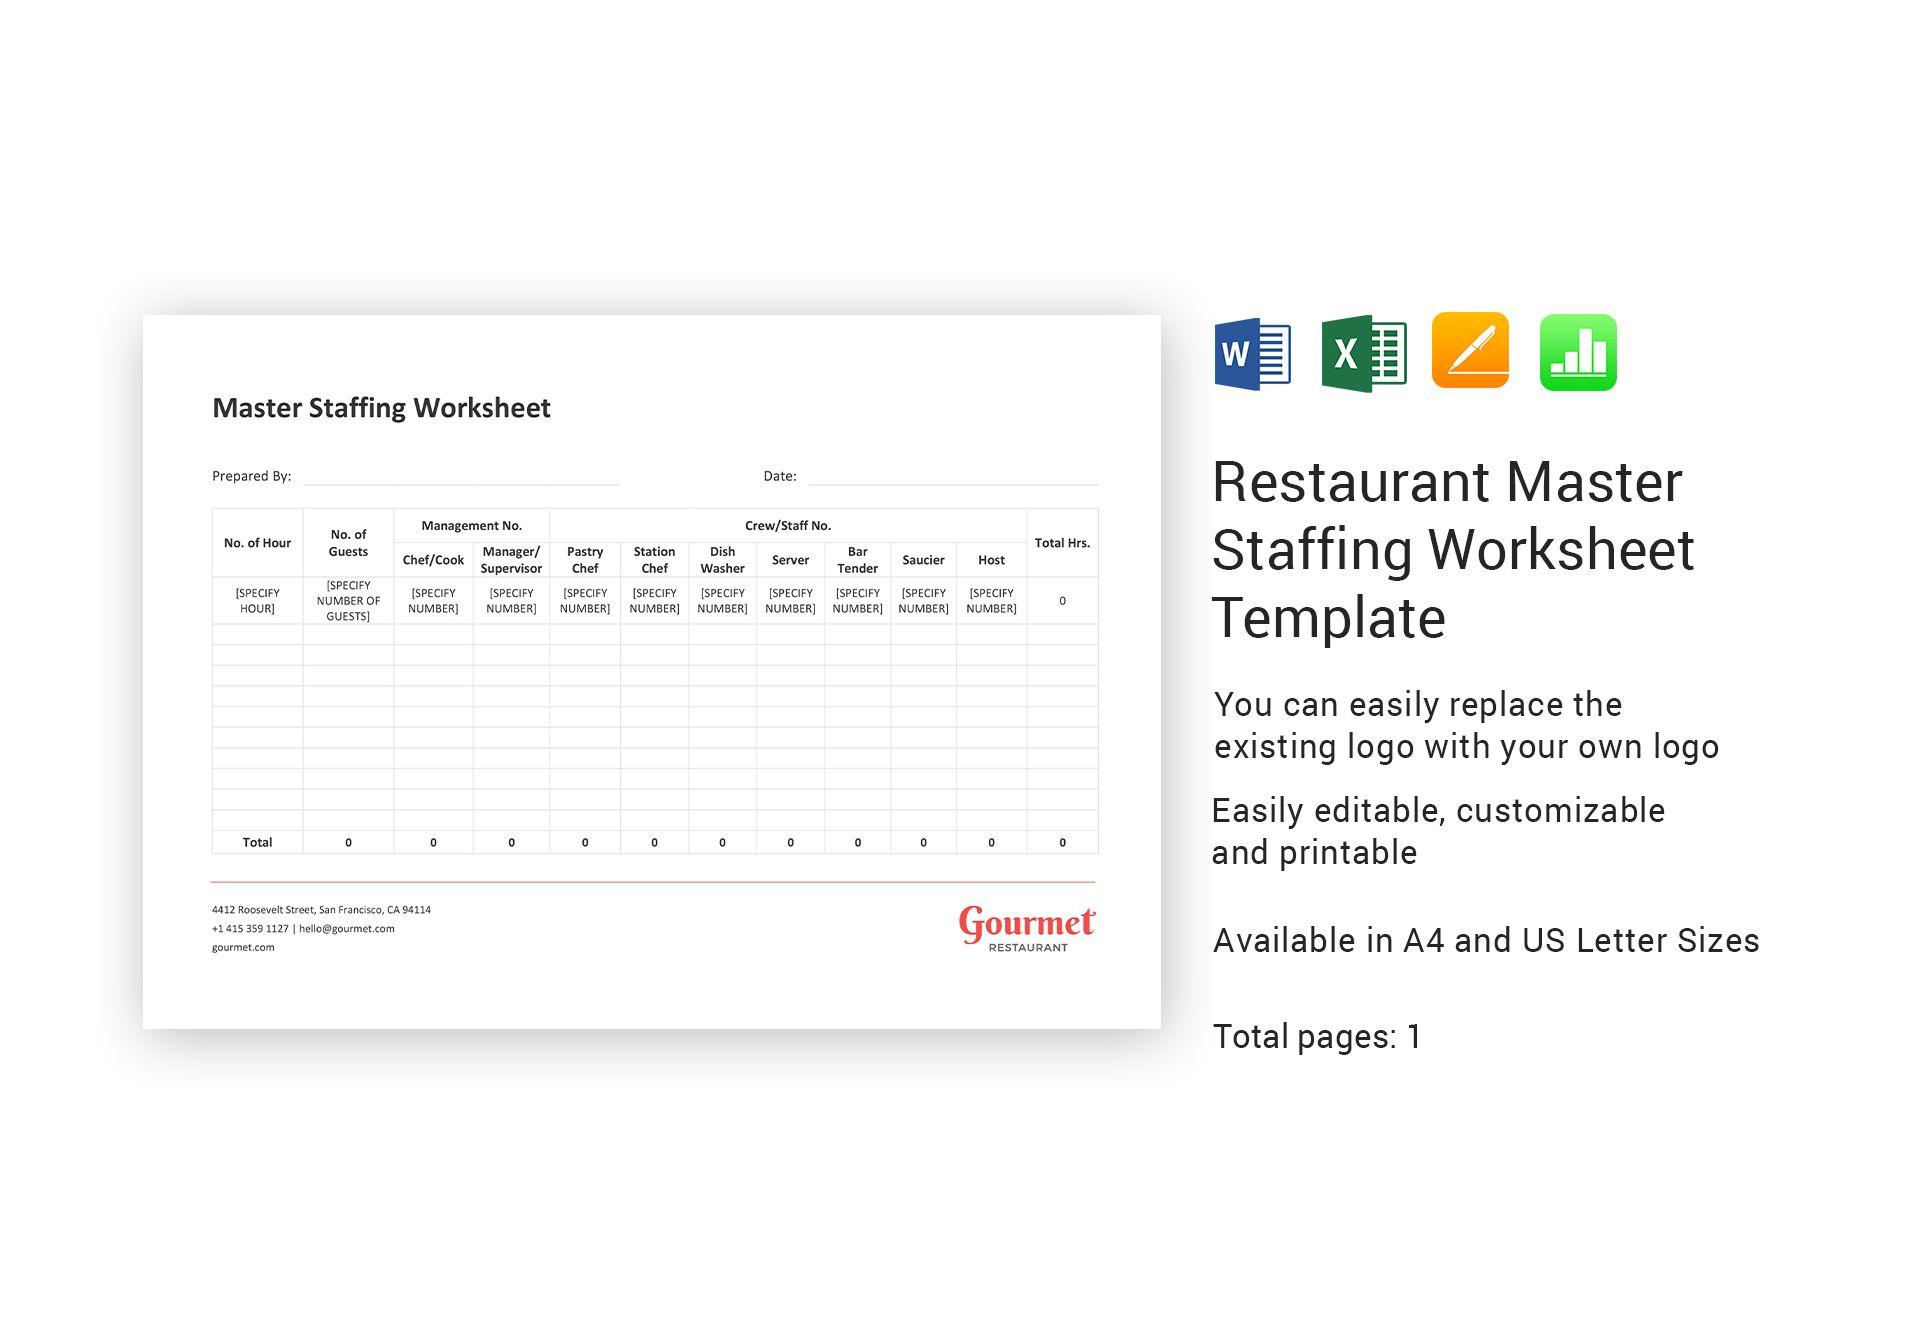 Restaurant Master Staffing Worksheet Template In Word